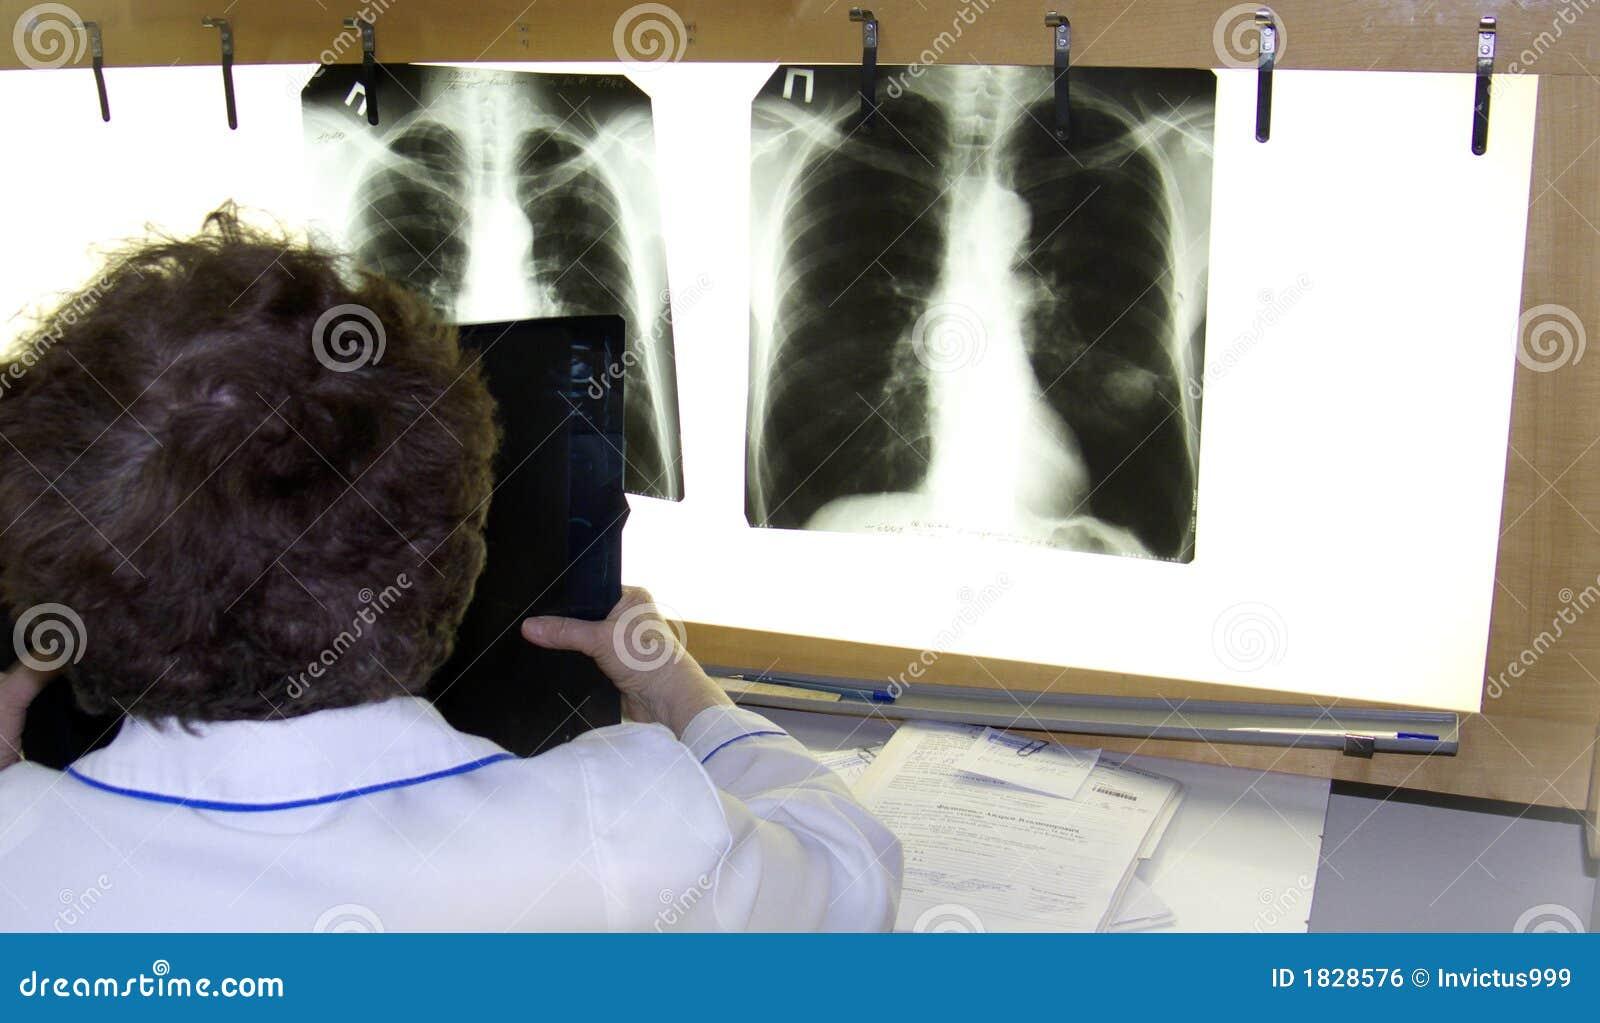 Un medico esamina i raggi X